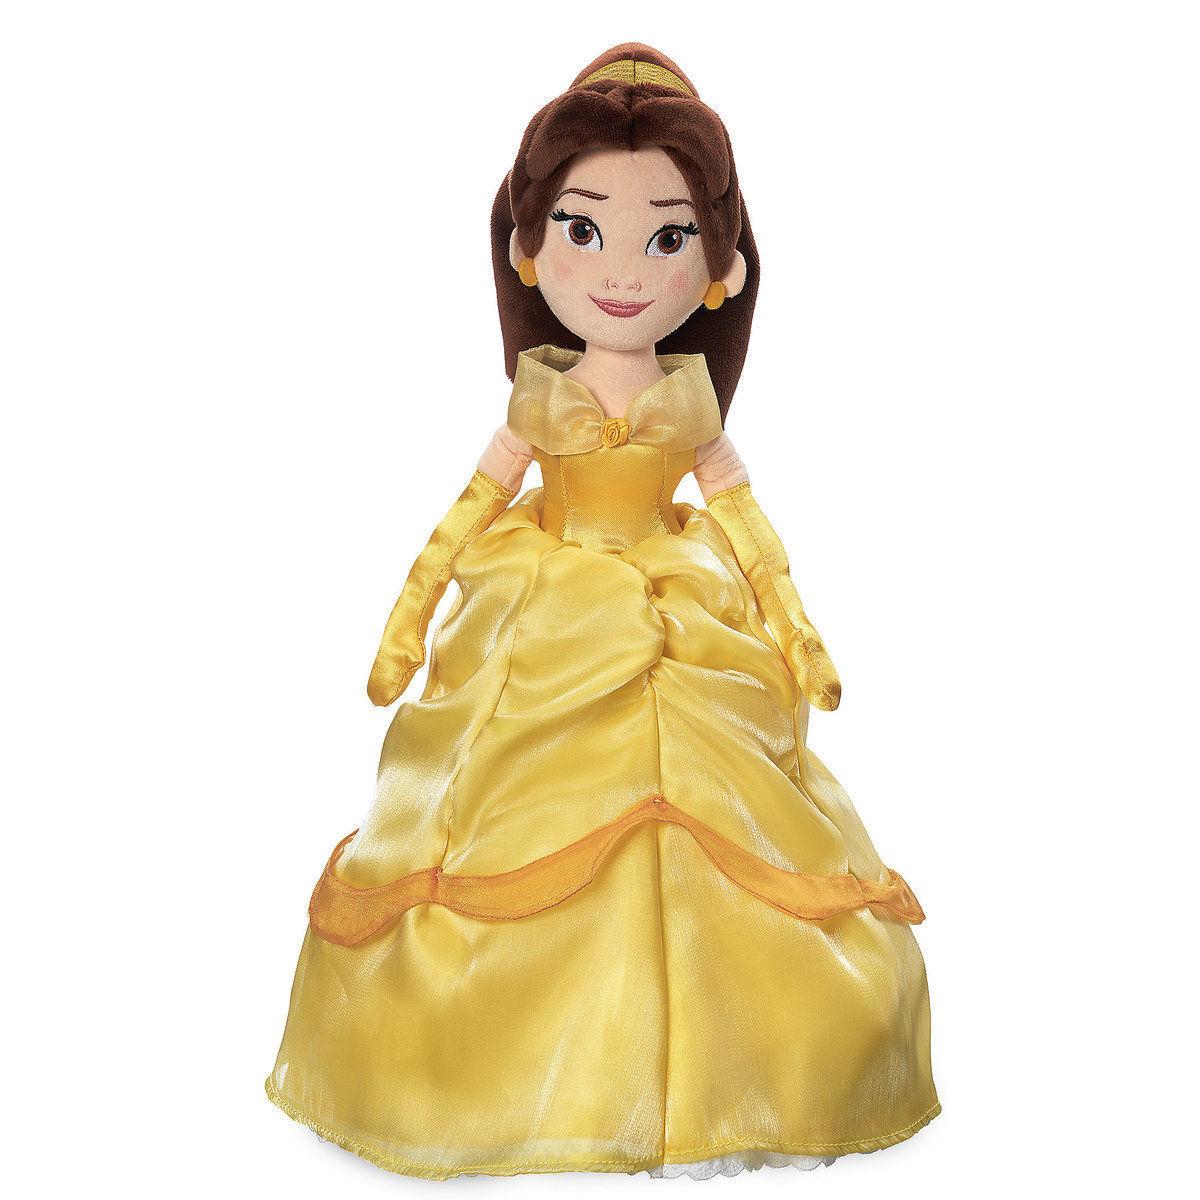 Disney Princess Belle Medium Plush New with Tags